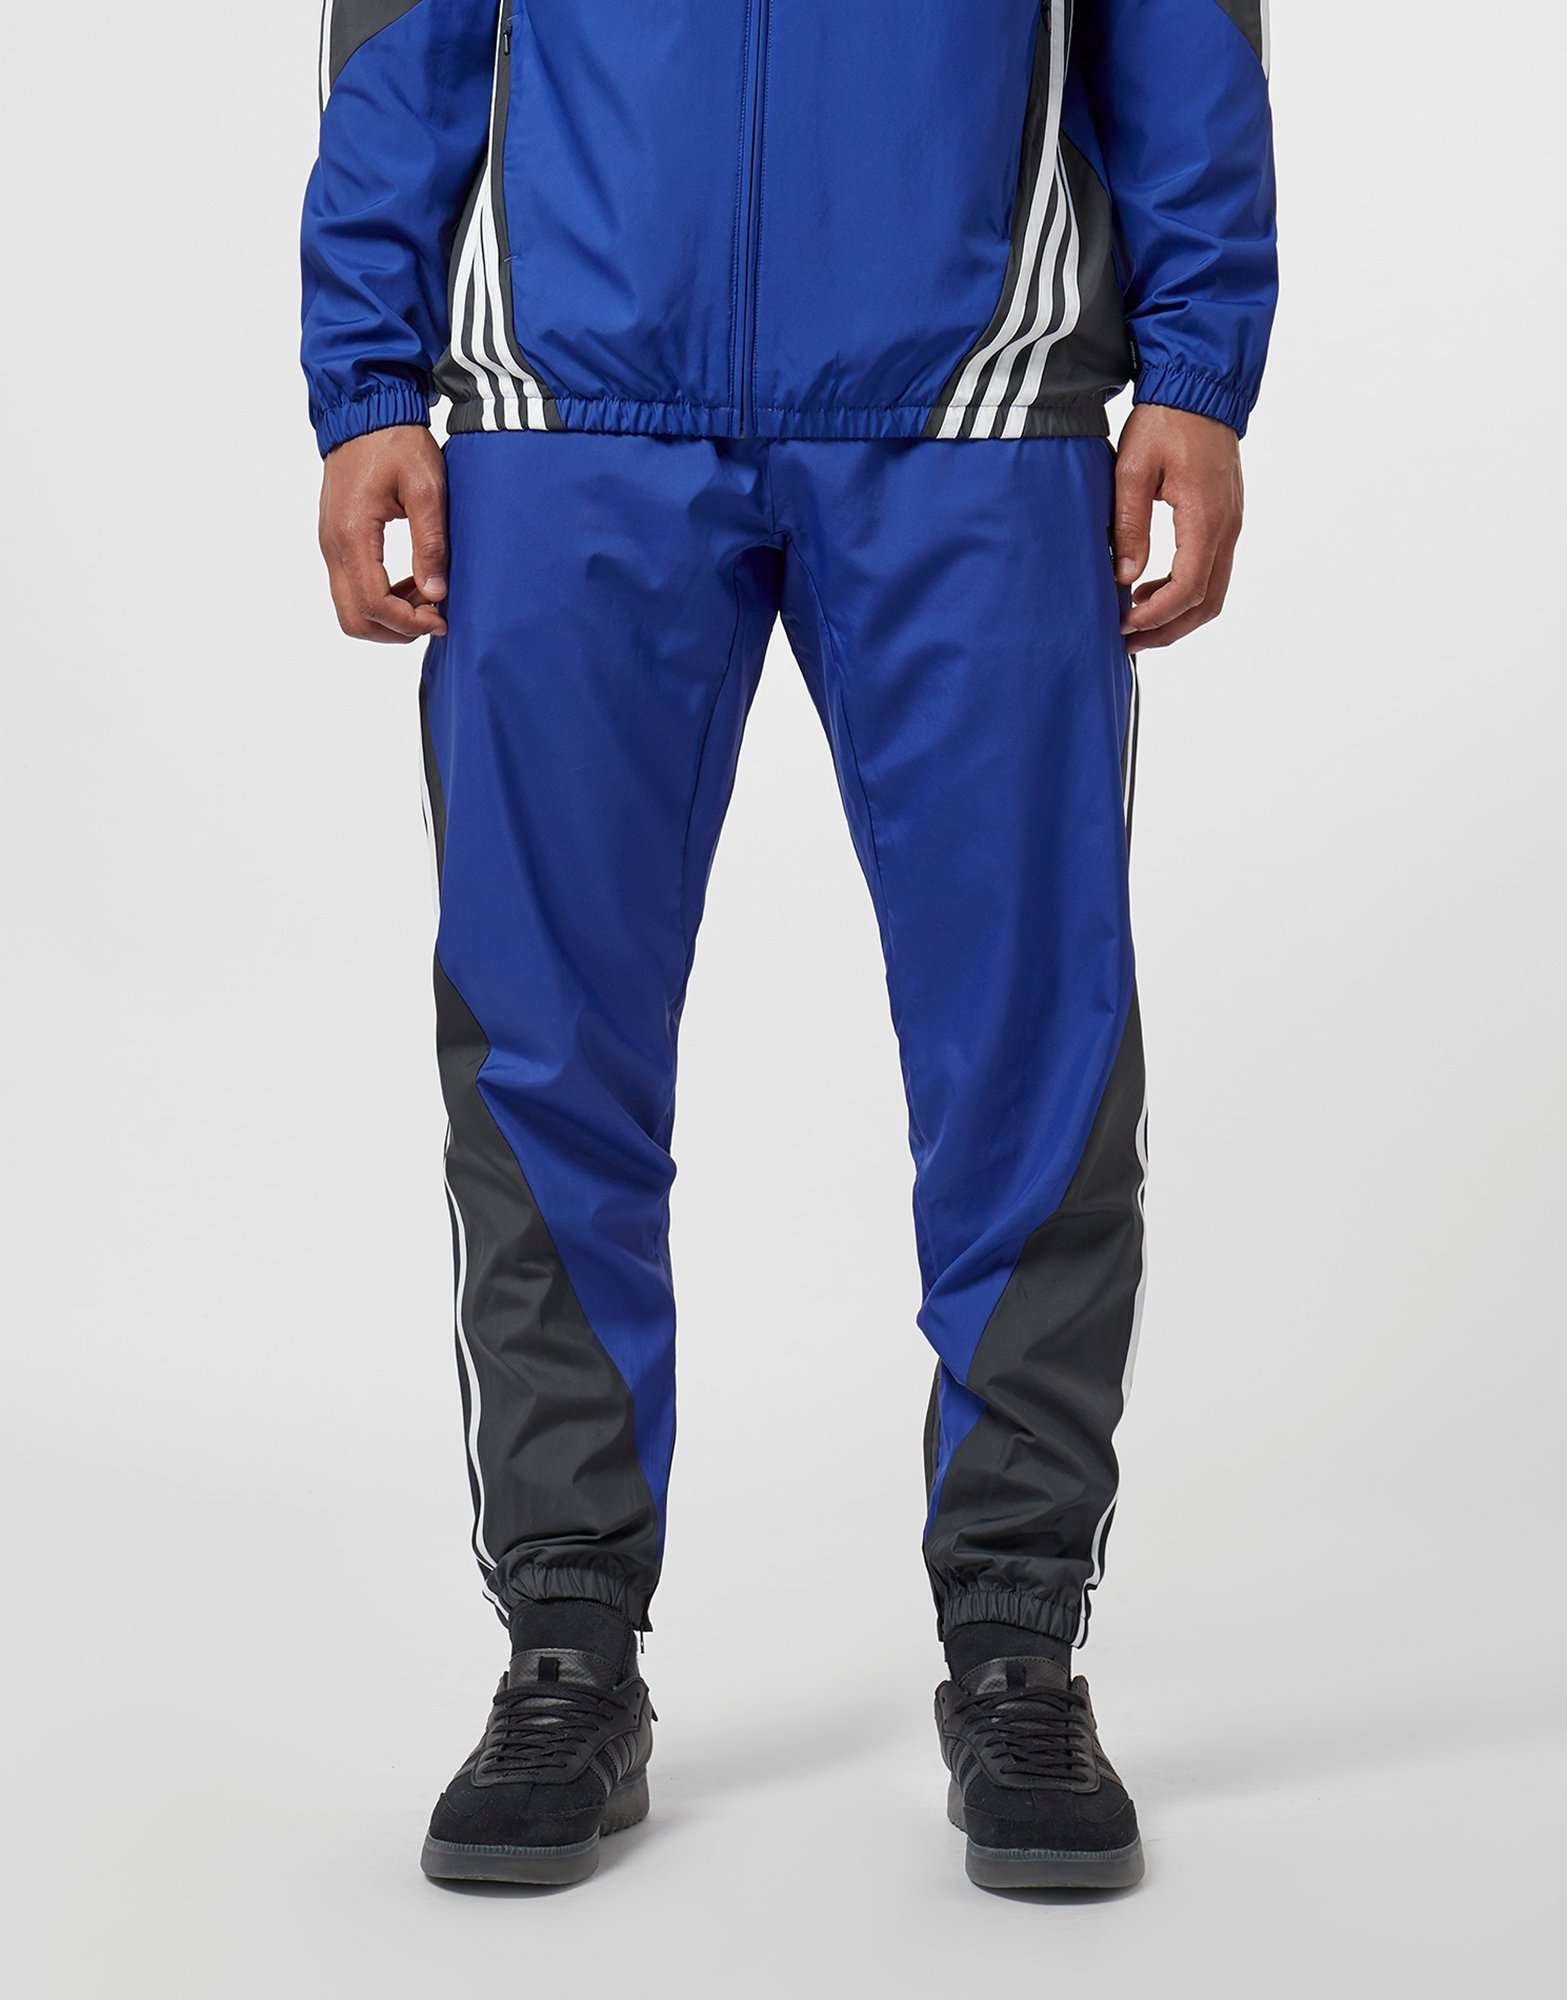 adidas Originals Insley Cuffed Track Pants